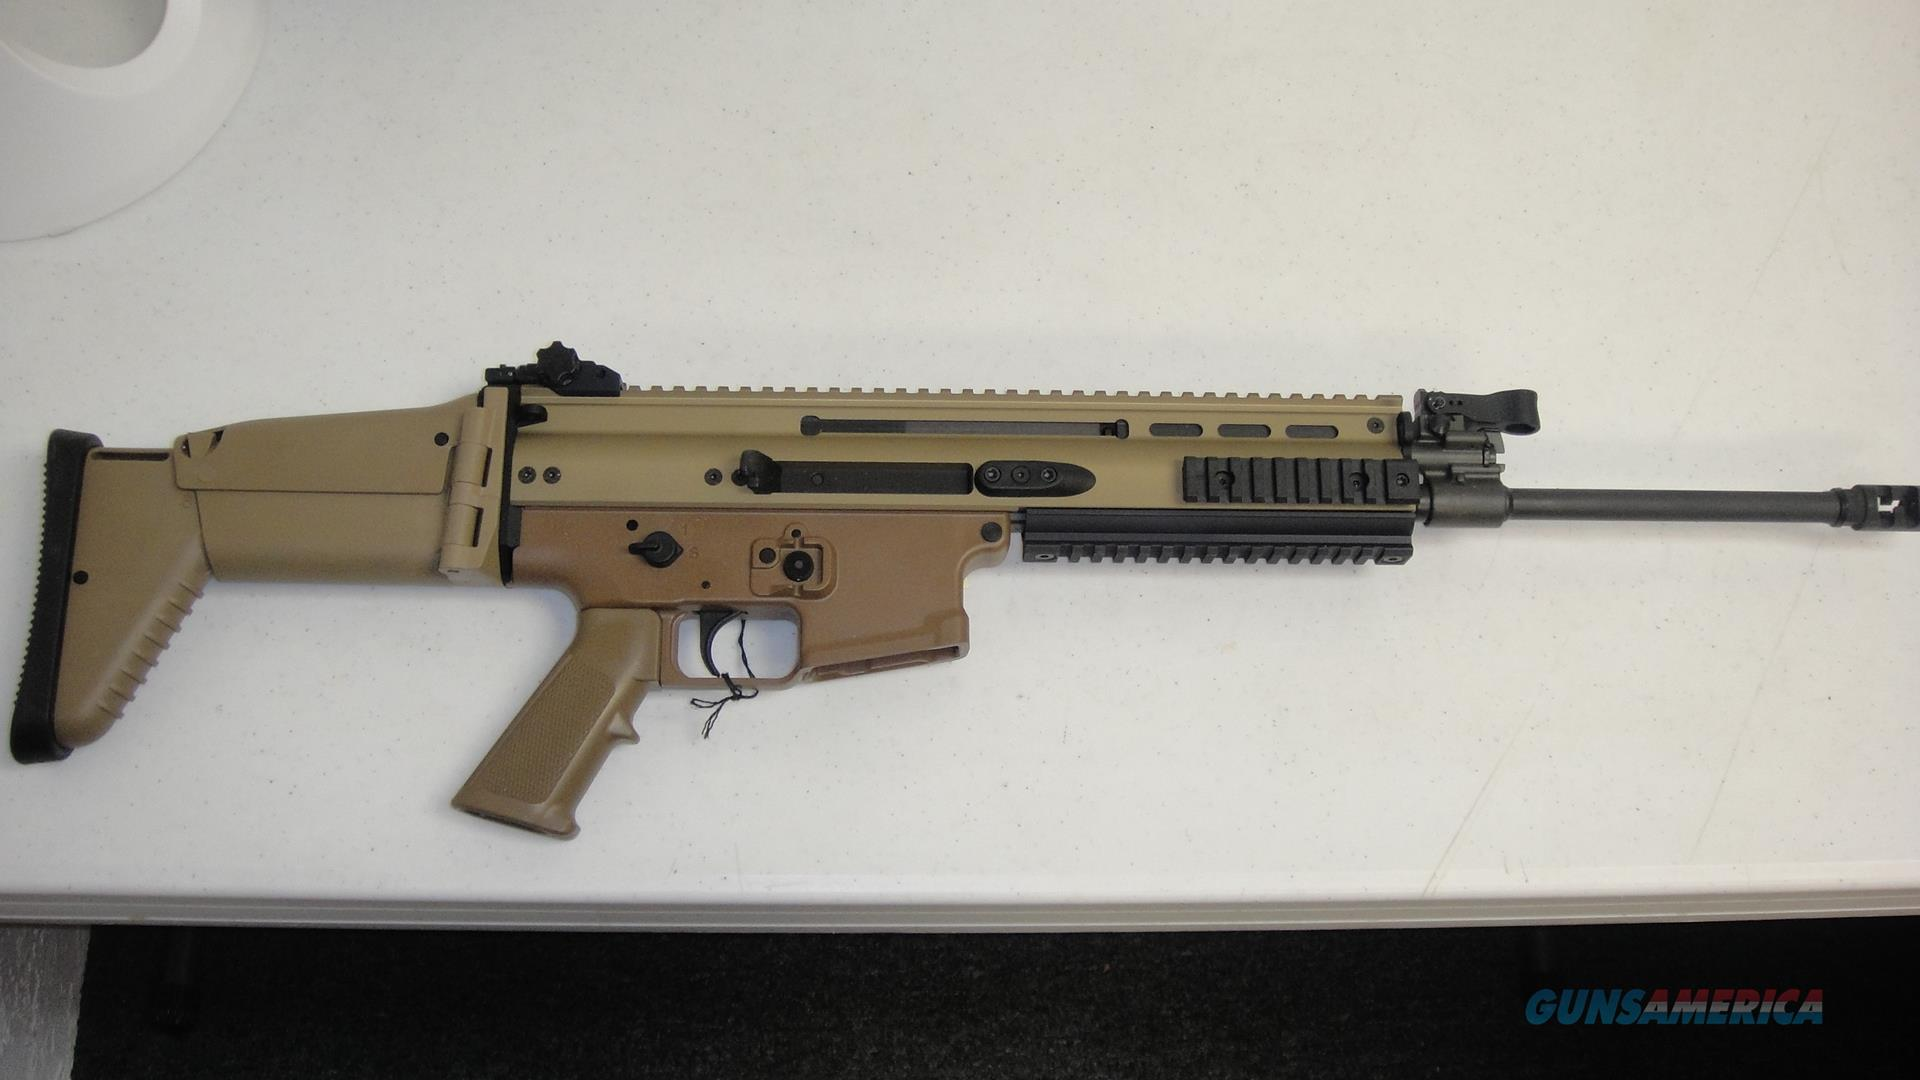 FNH SCAR 16S  Guns > Rifles > FNH - Fabrique Nationale (FN) Rifles > Semi-auto > SCAR